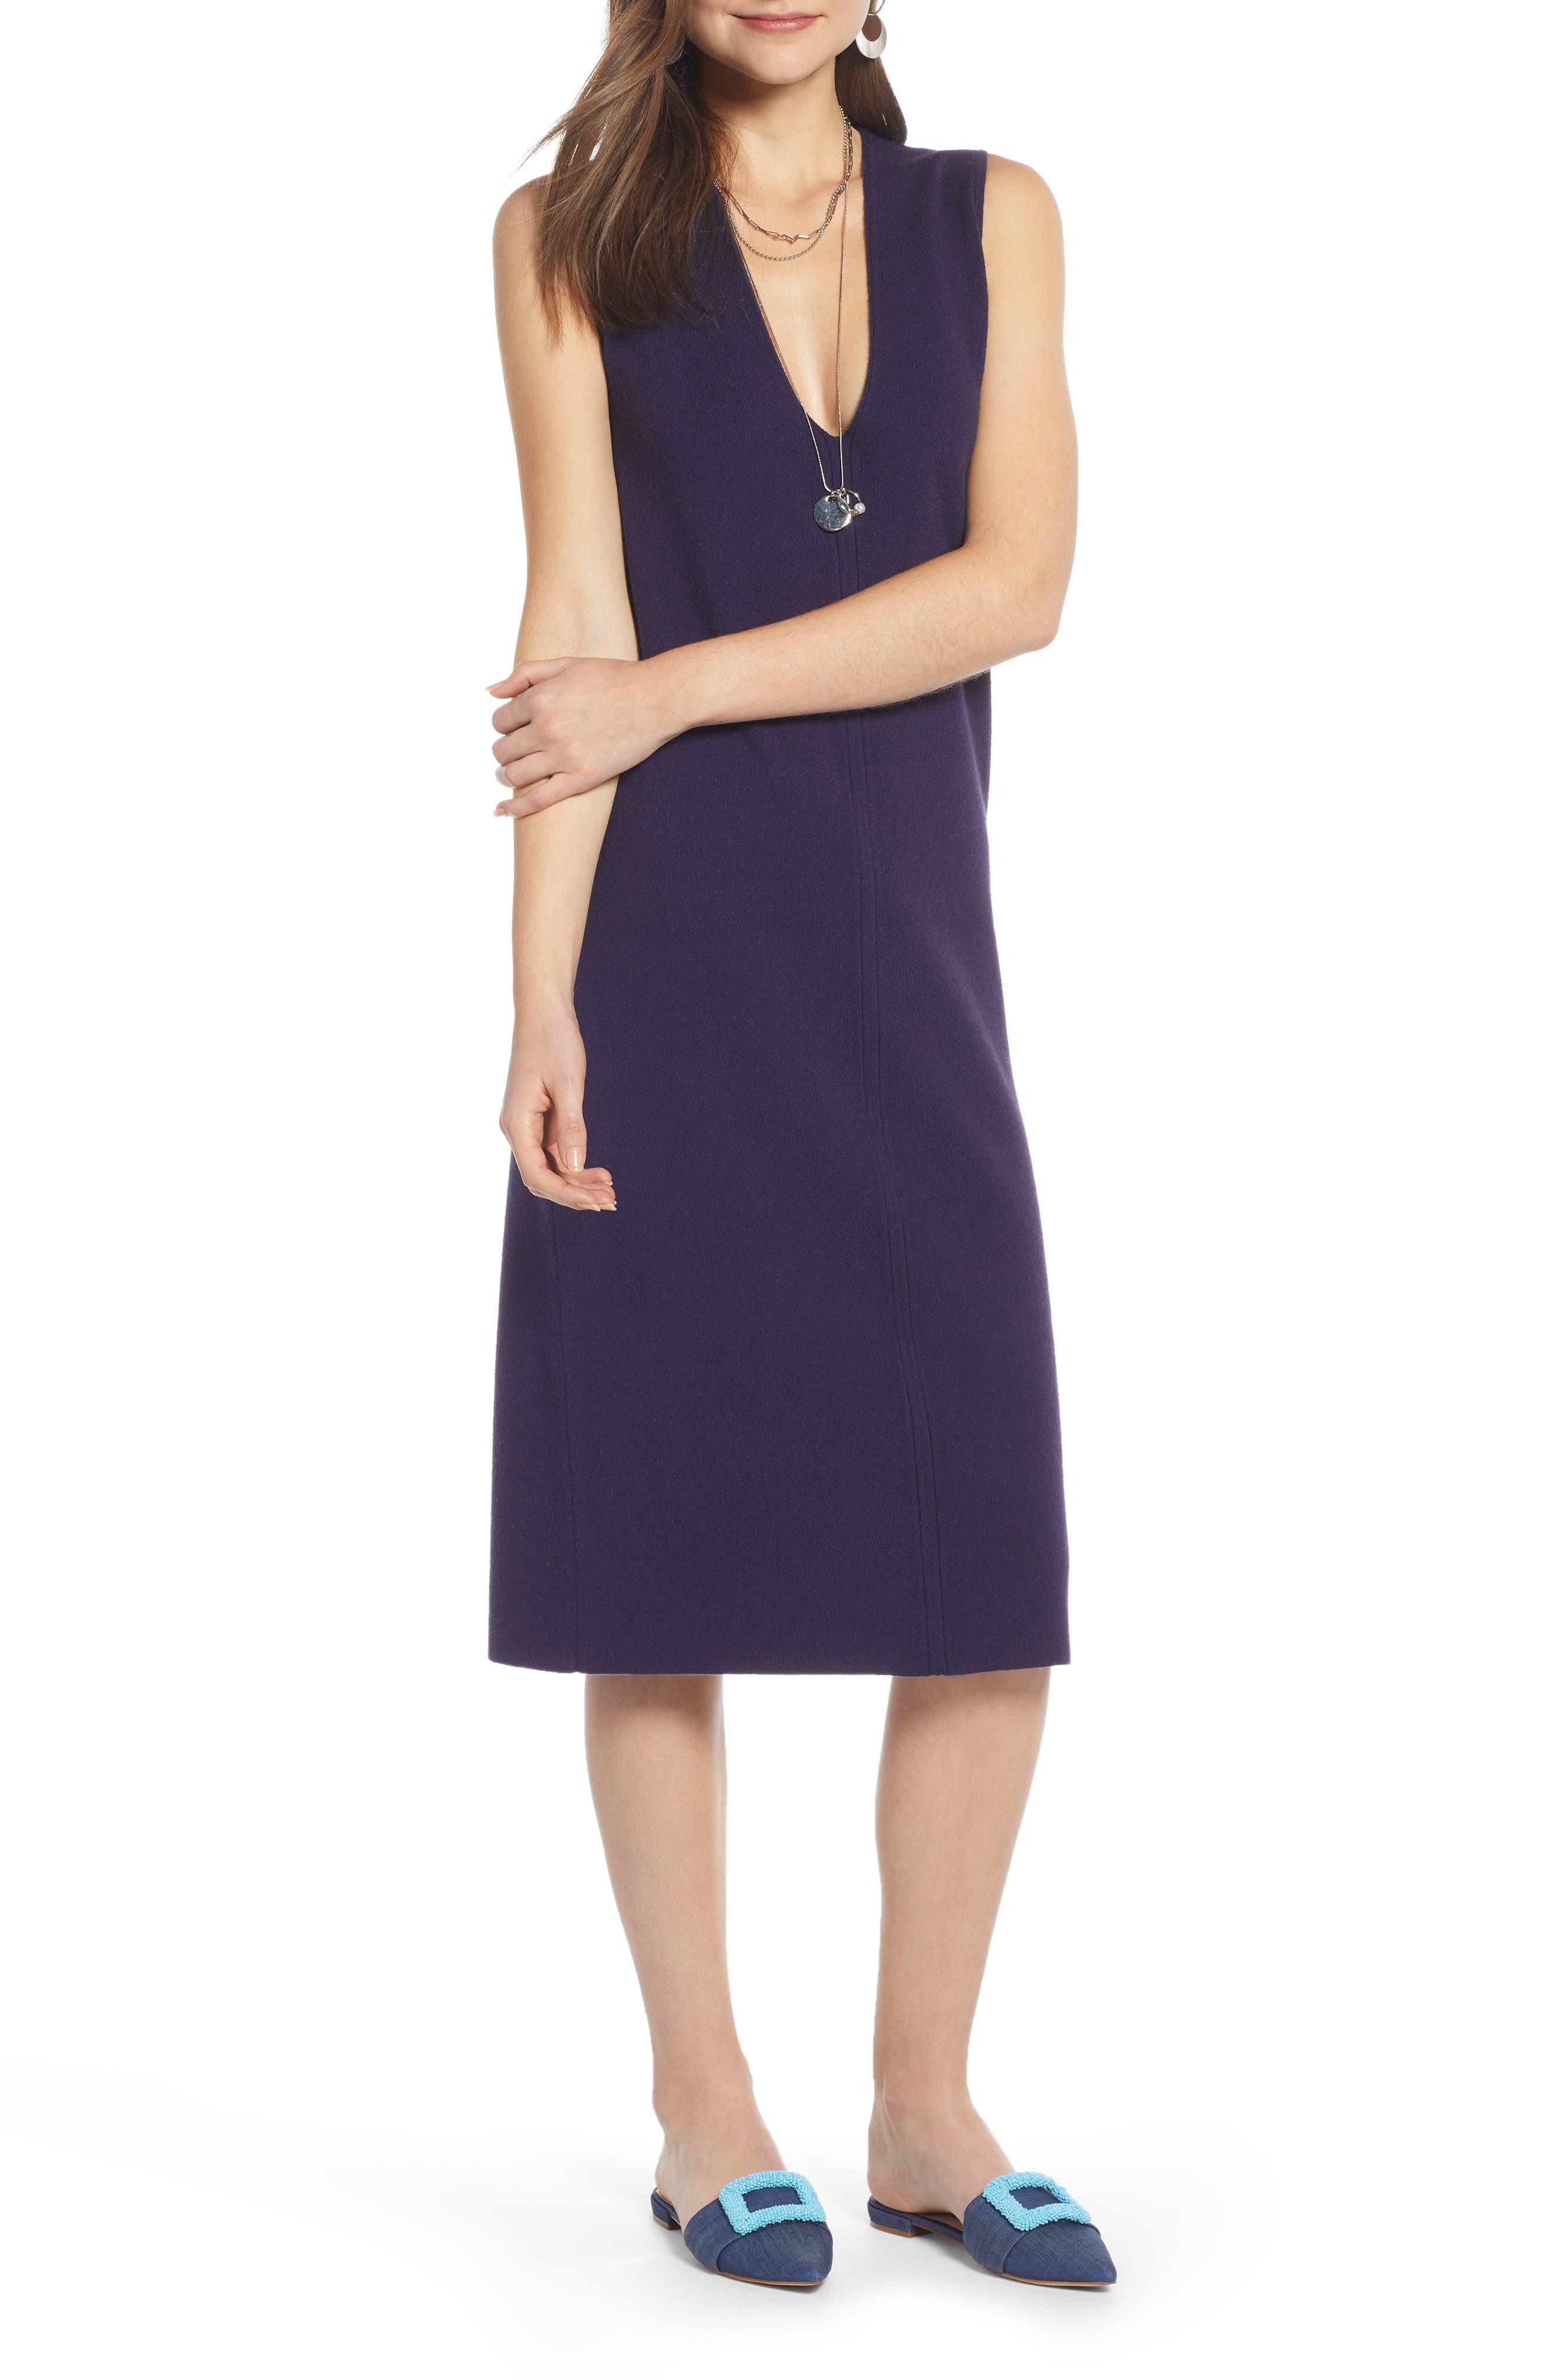 SOMETHING NAVY, Sleeveless Sweater Dress, Main thumbnail 1, color, 401